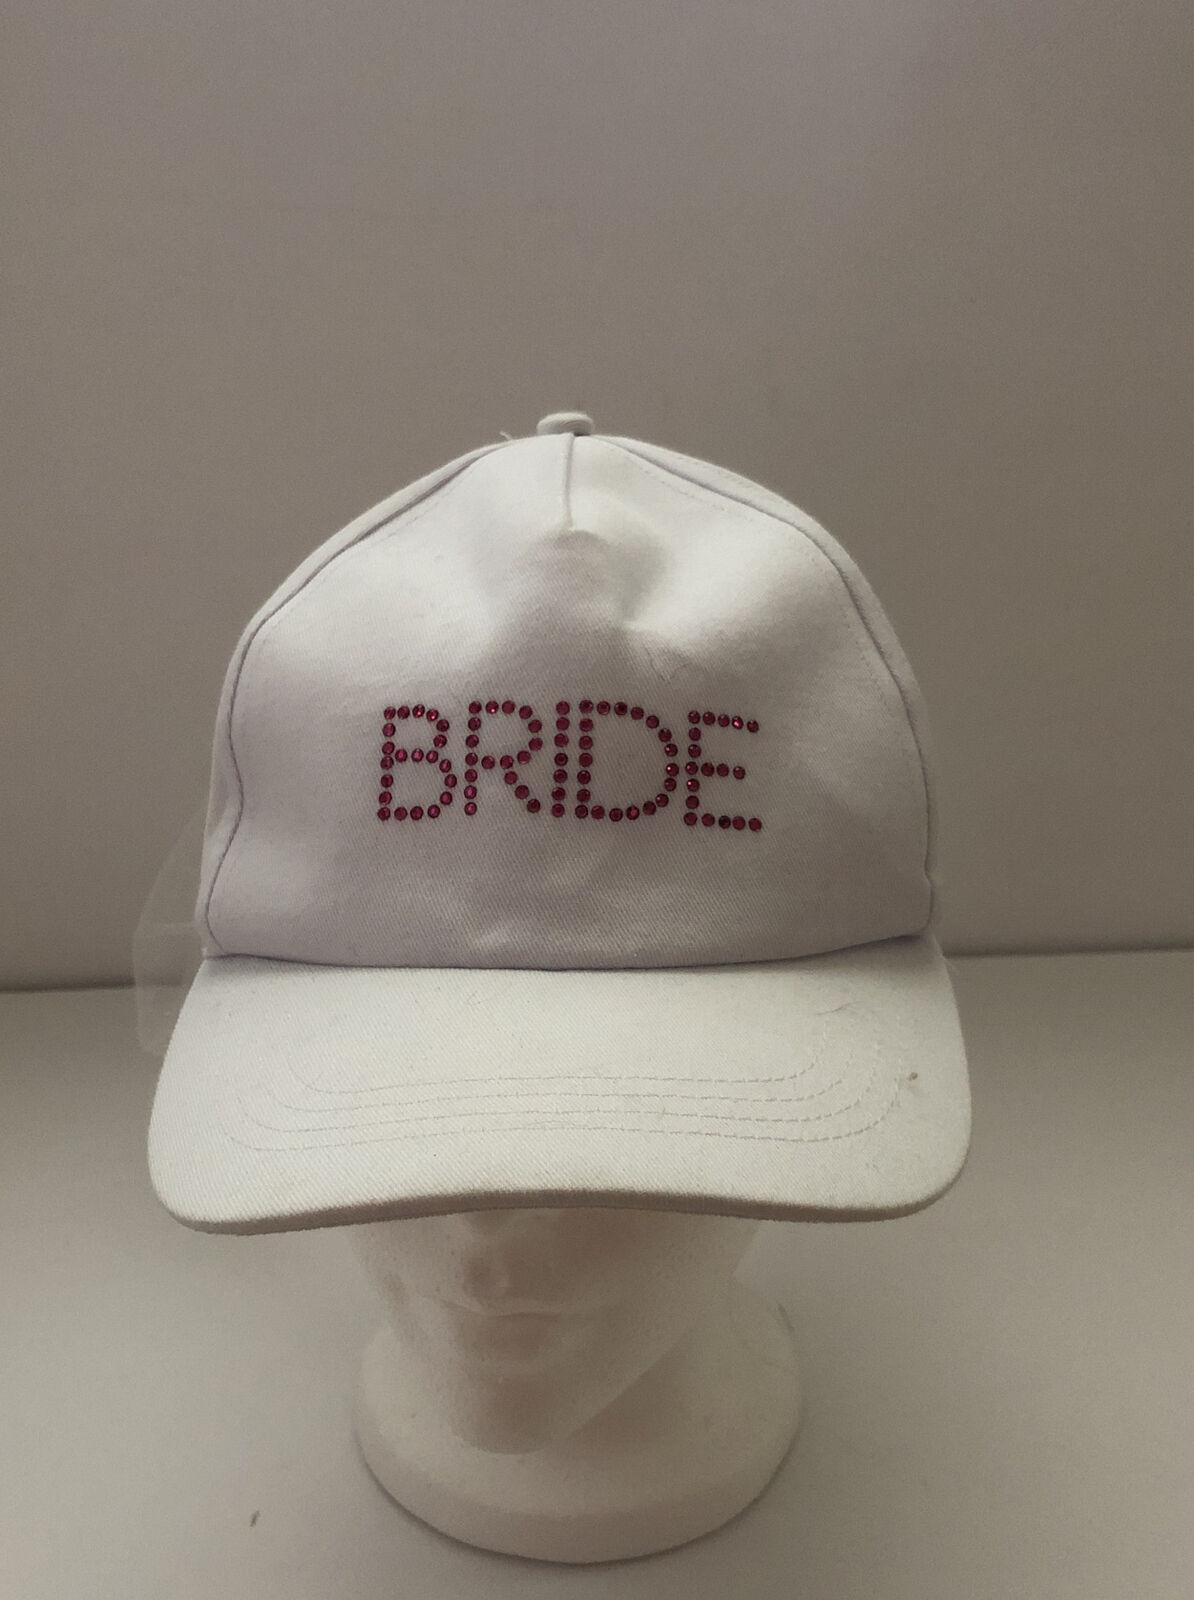 Bride With Veil Wedding Ball Cap Hat Adjustable Baseball Adult